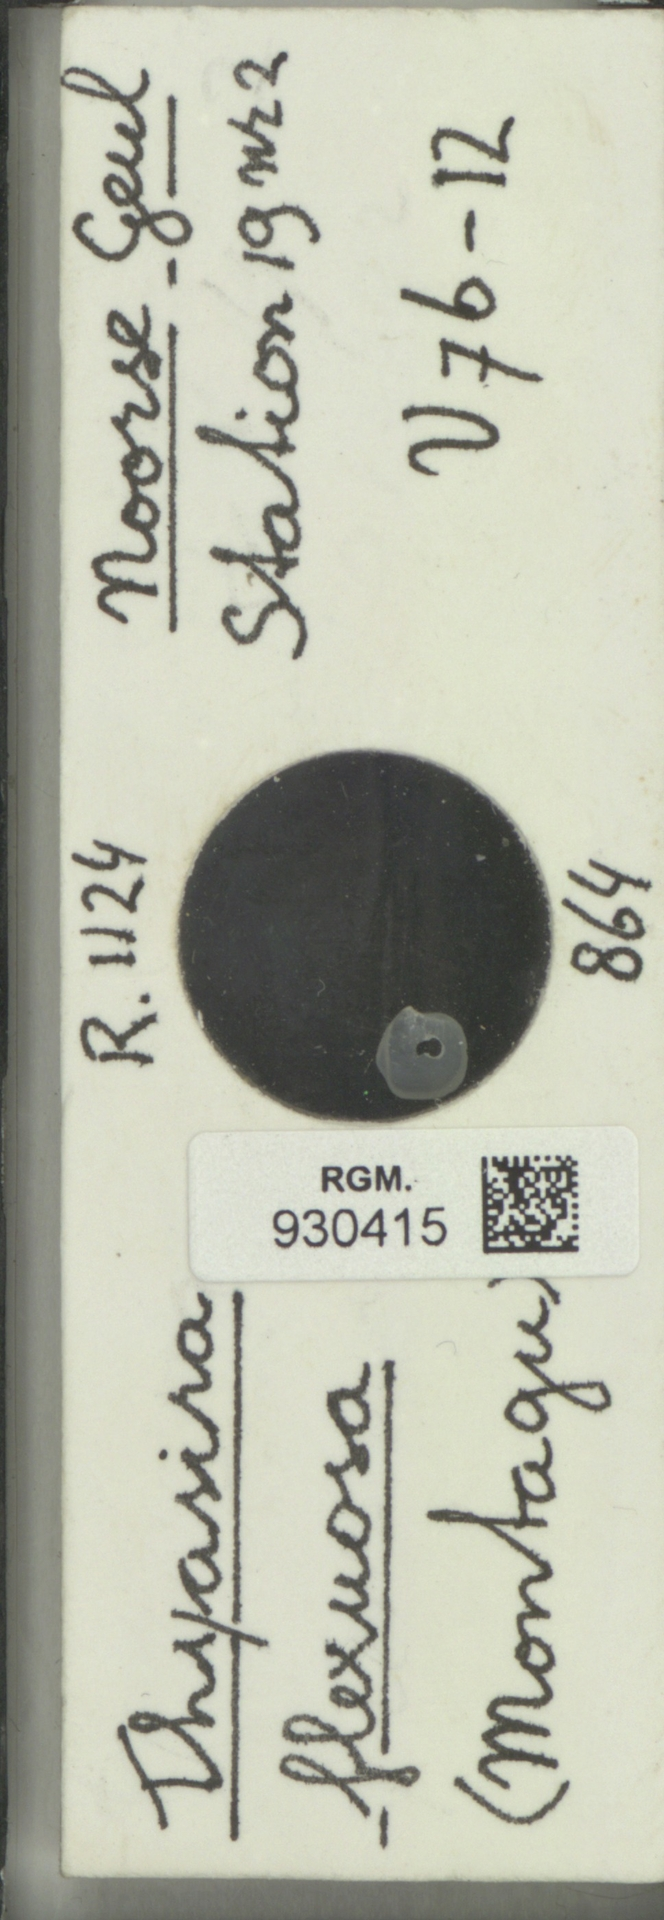 RGM.930415 | Thyasira flexuosa (Montagu)